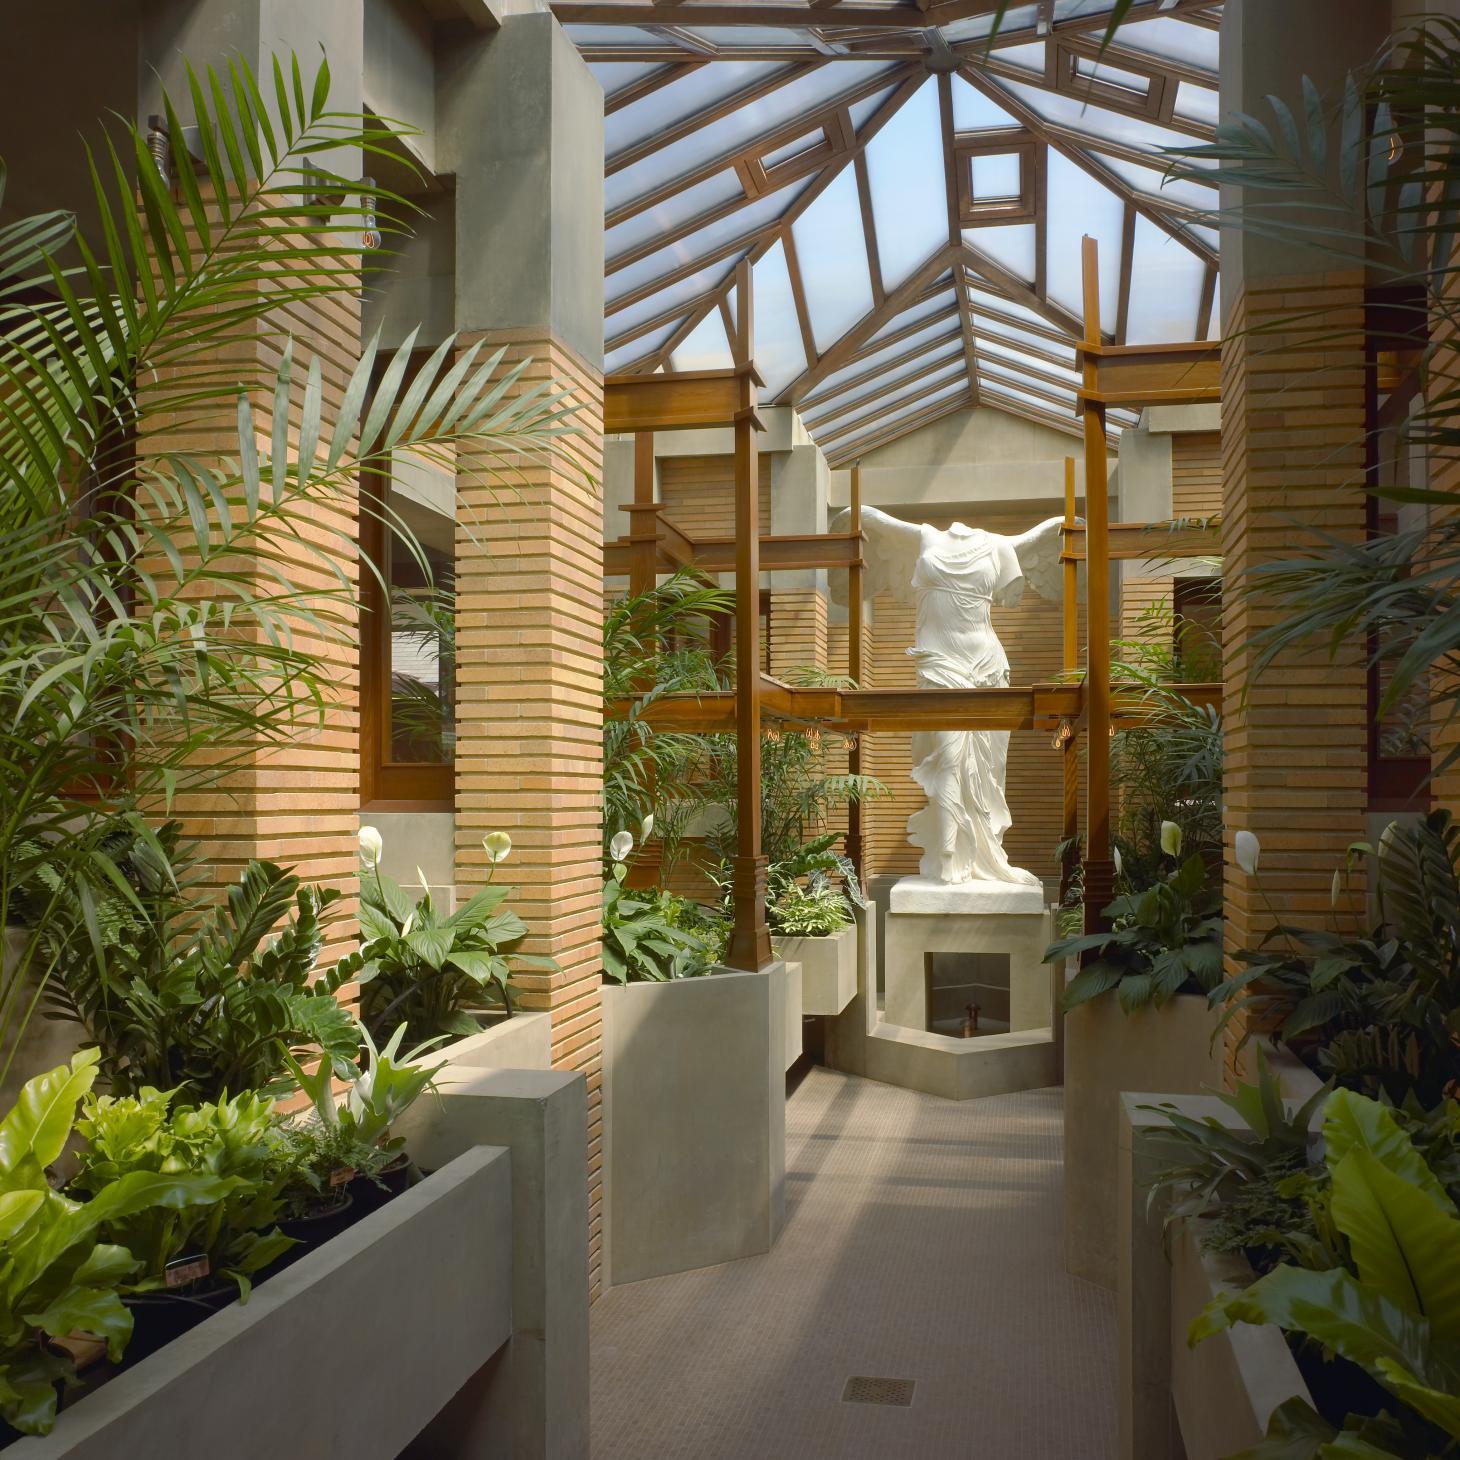 martin_house_conservatory_by_biff_henrich_img_ink_courtesy_martin_house_restoration_corporation